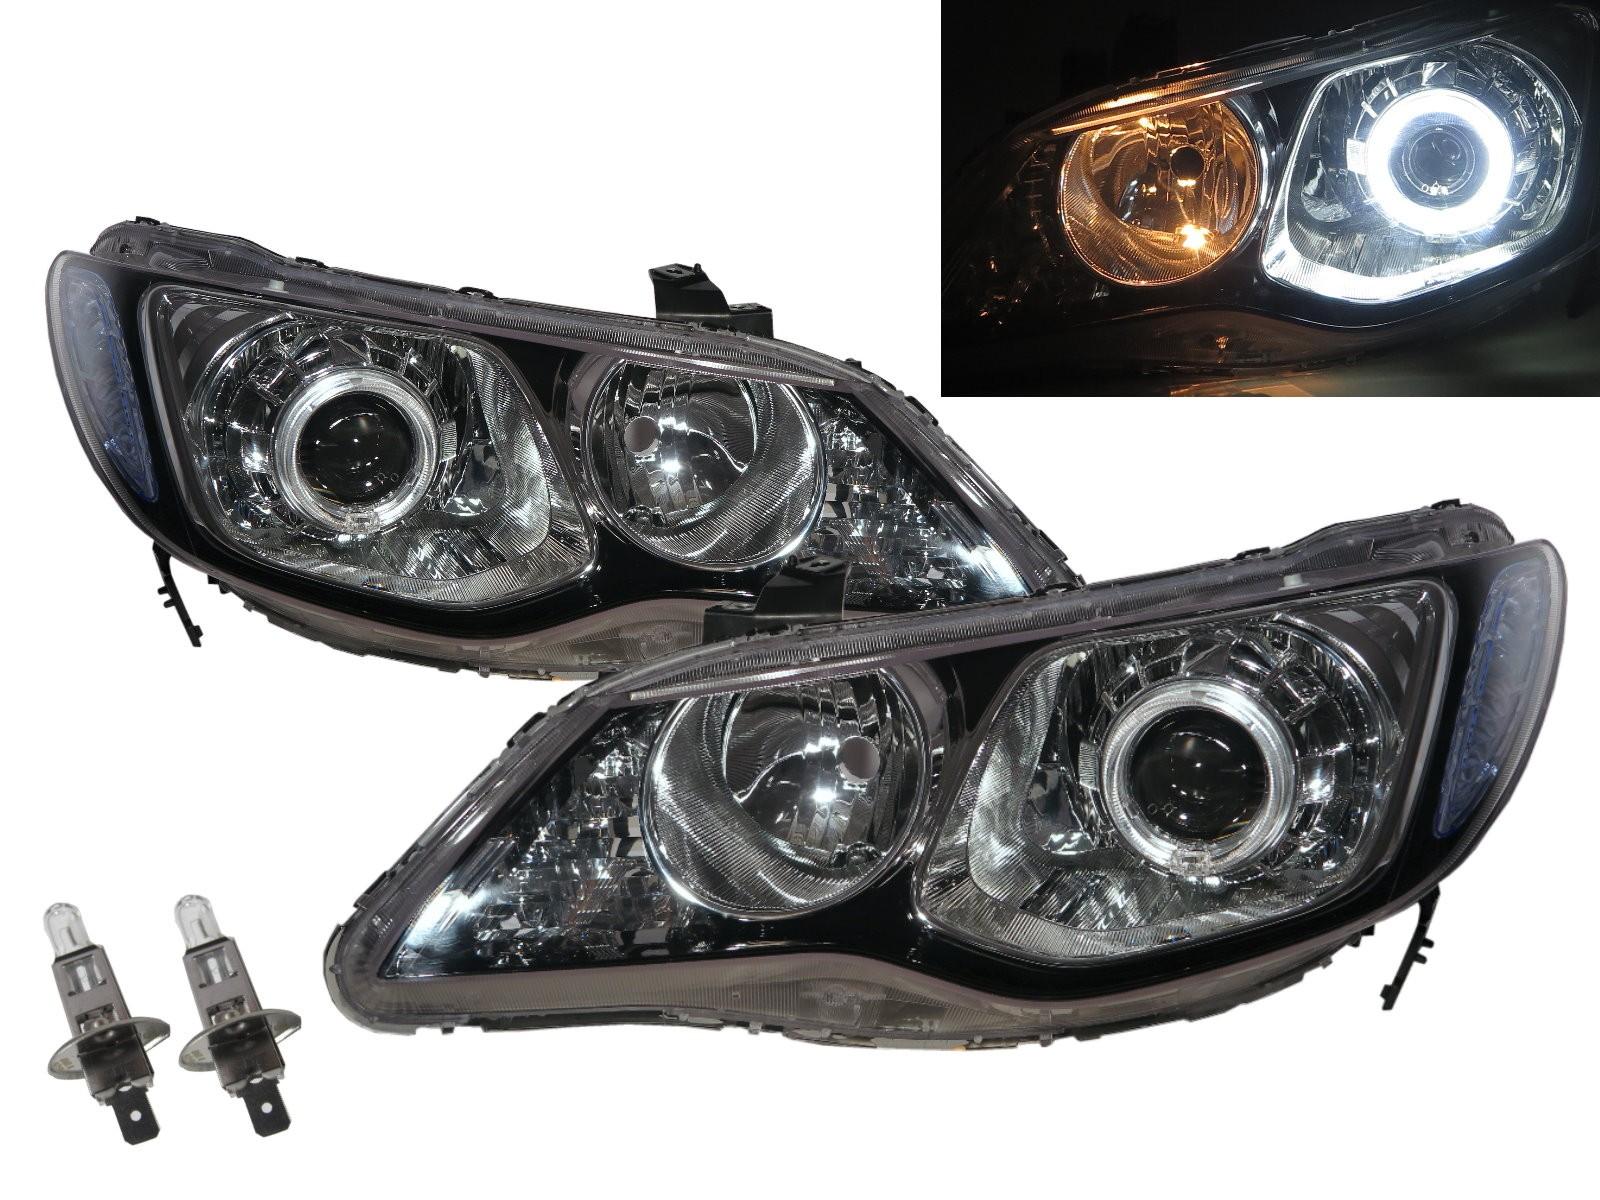 CrazyTheGod Ciimo 2006-2011 Sedan 4D Guide LED Angel-Eye Projector Headlight Headlamp Black RussiaSouth AfricaASIAJAPANAustralia for Dongfeng RHD